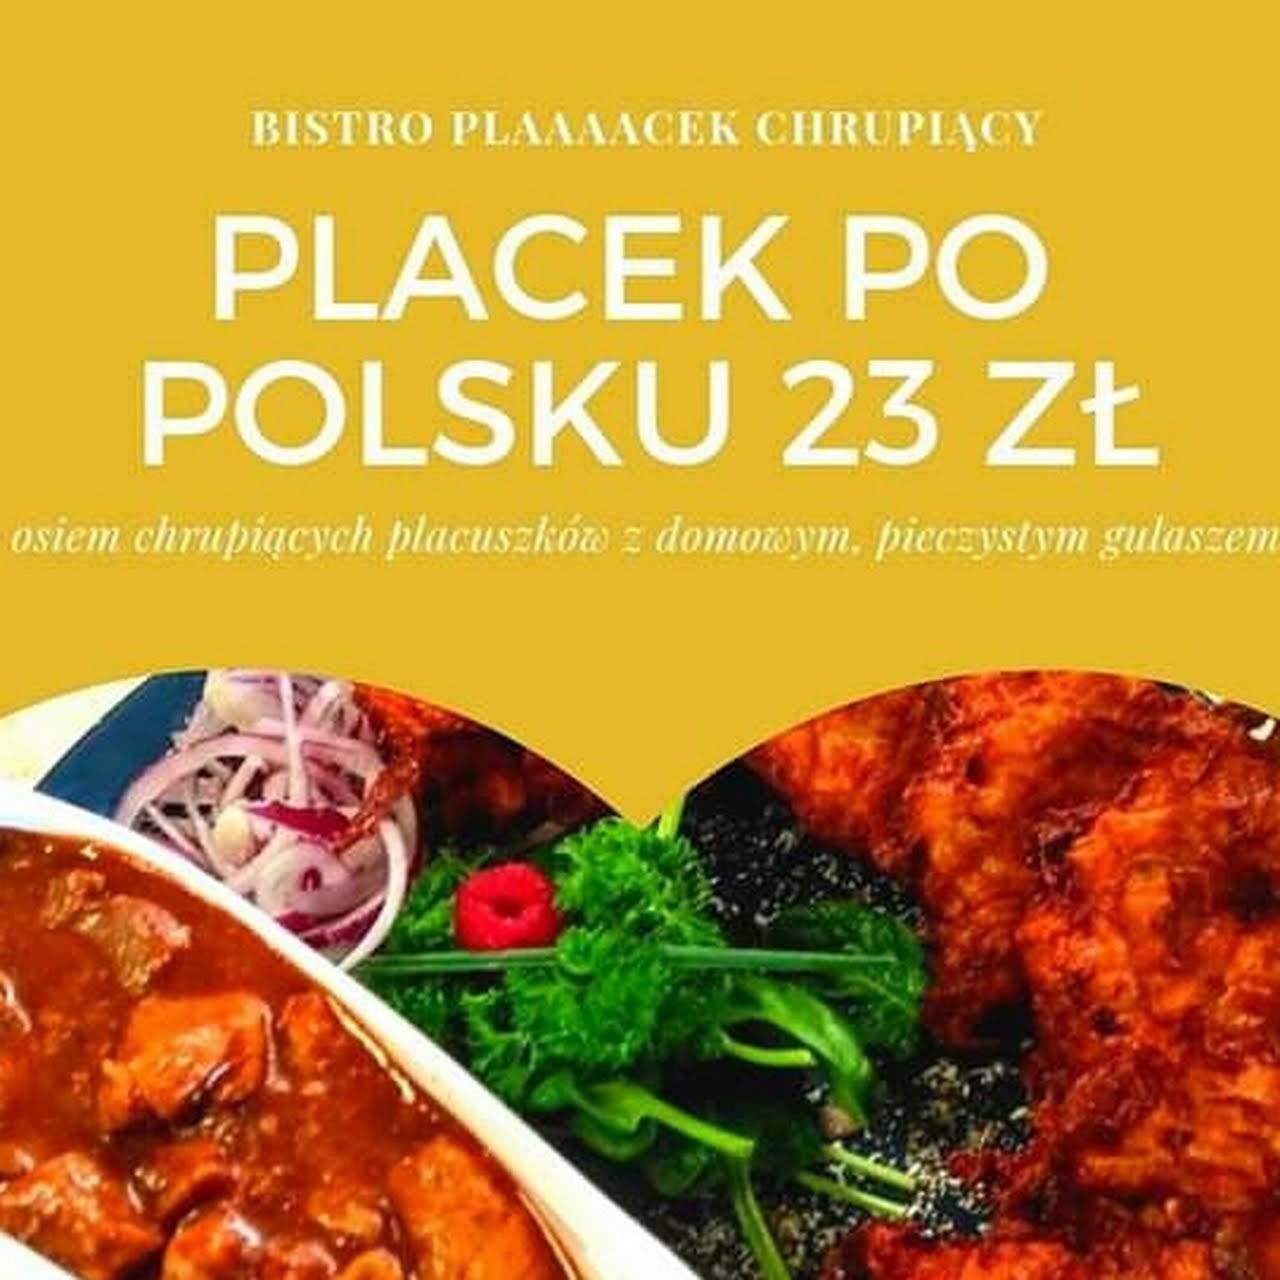 Bistro Plaaaacek Chrupiacy Kuchenne Rewolucje Kuchnia Polska W